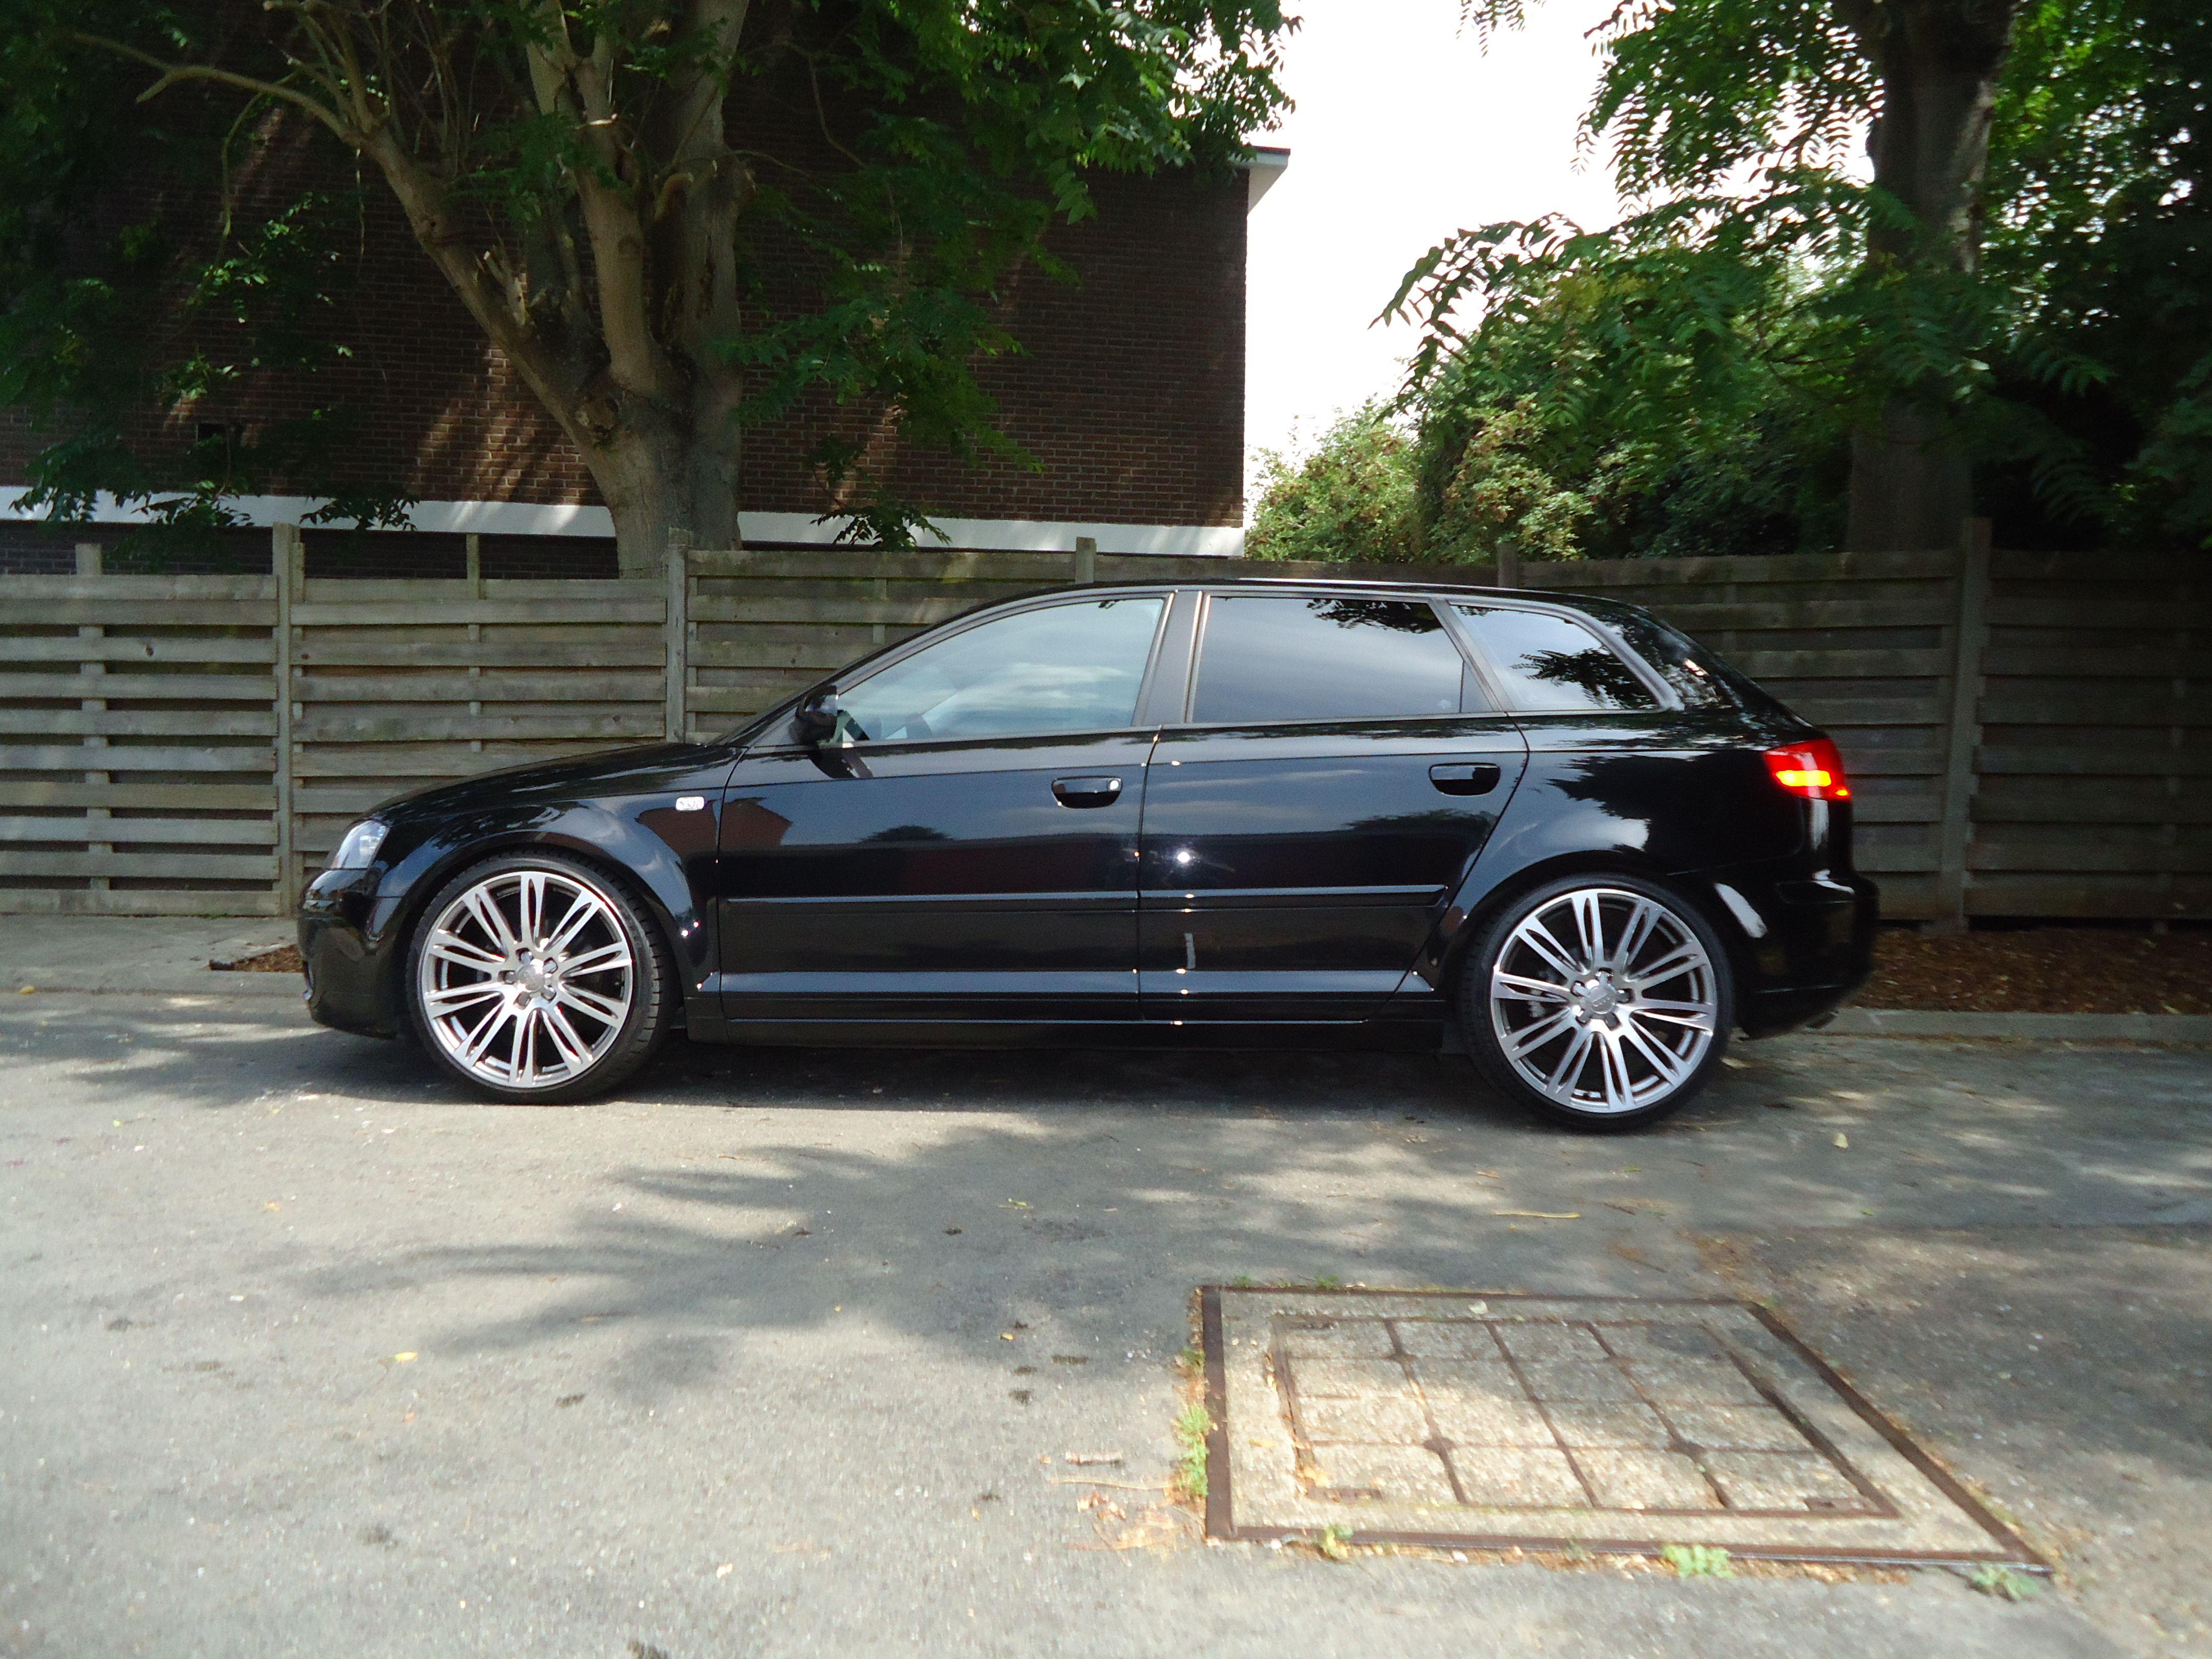 Kekurangan Audi A3 2007 Top Model Tahun Ini